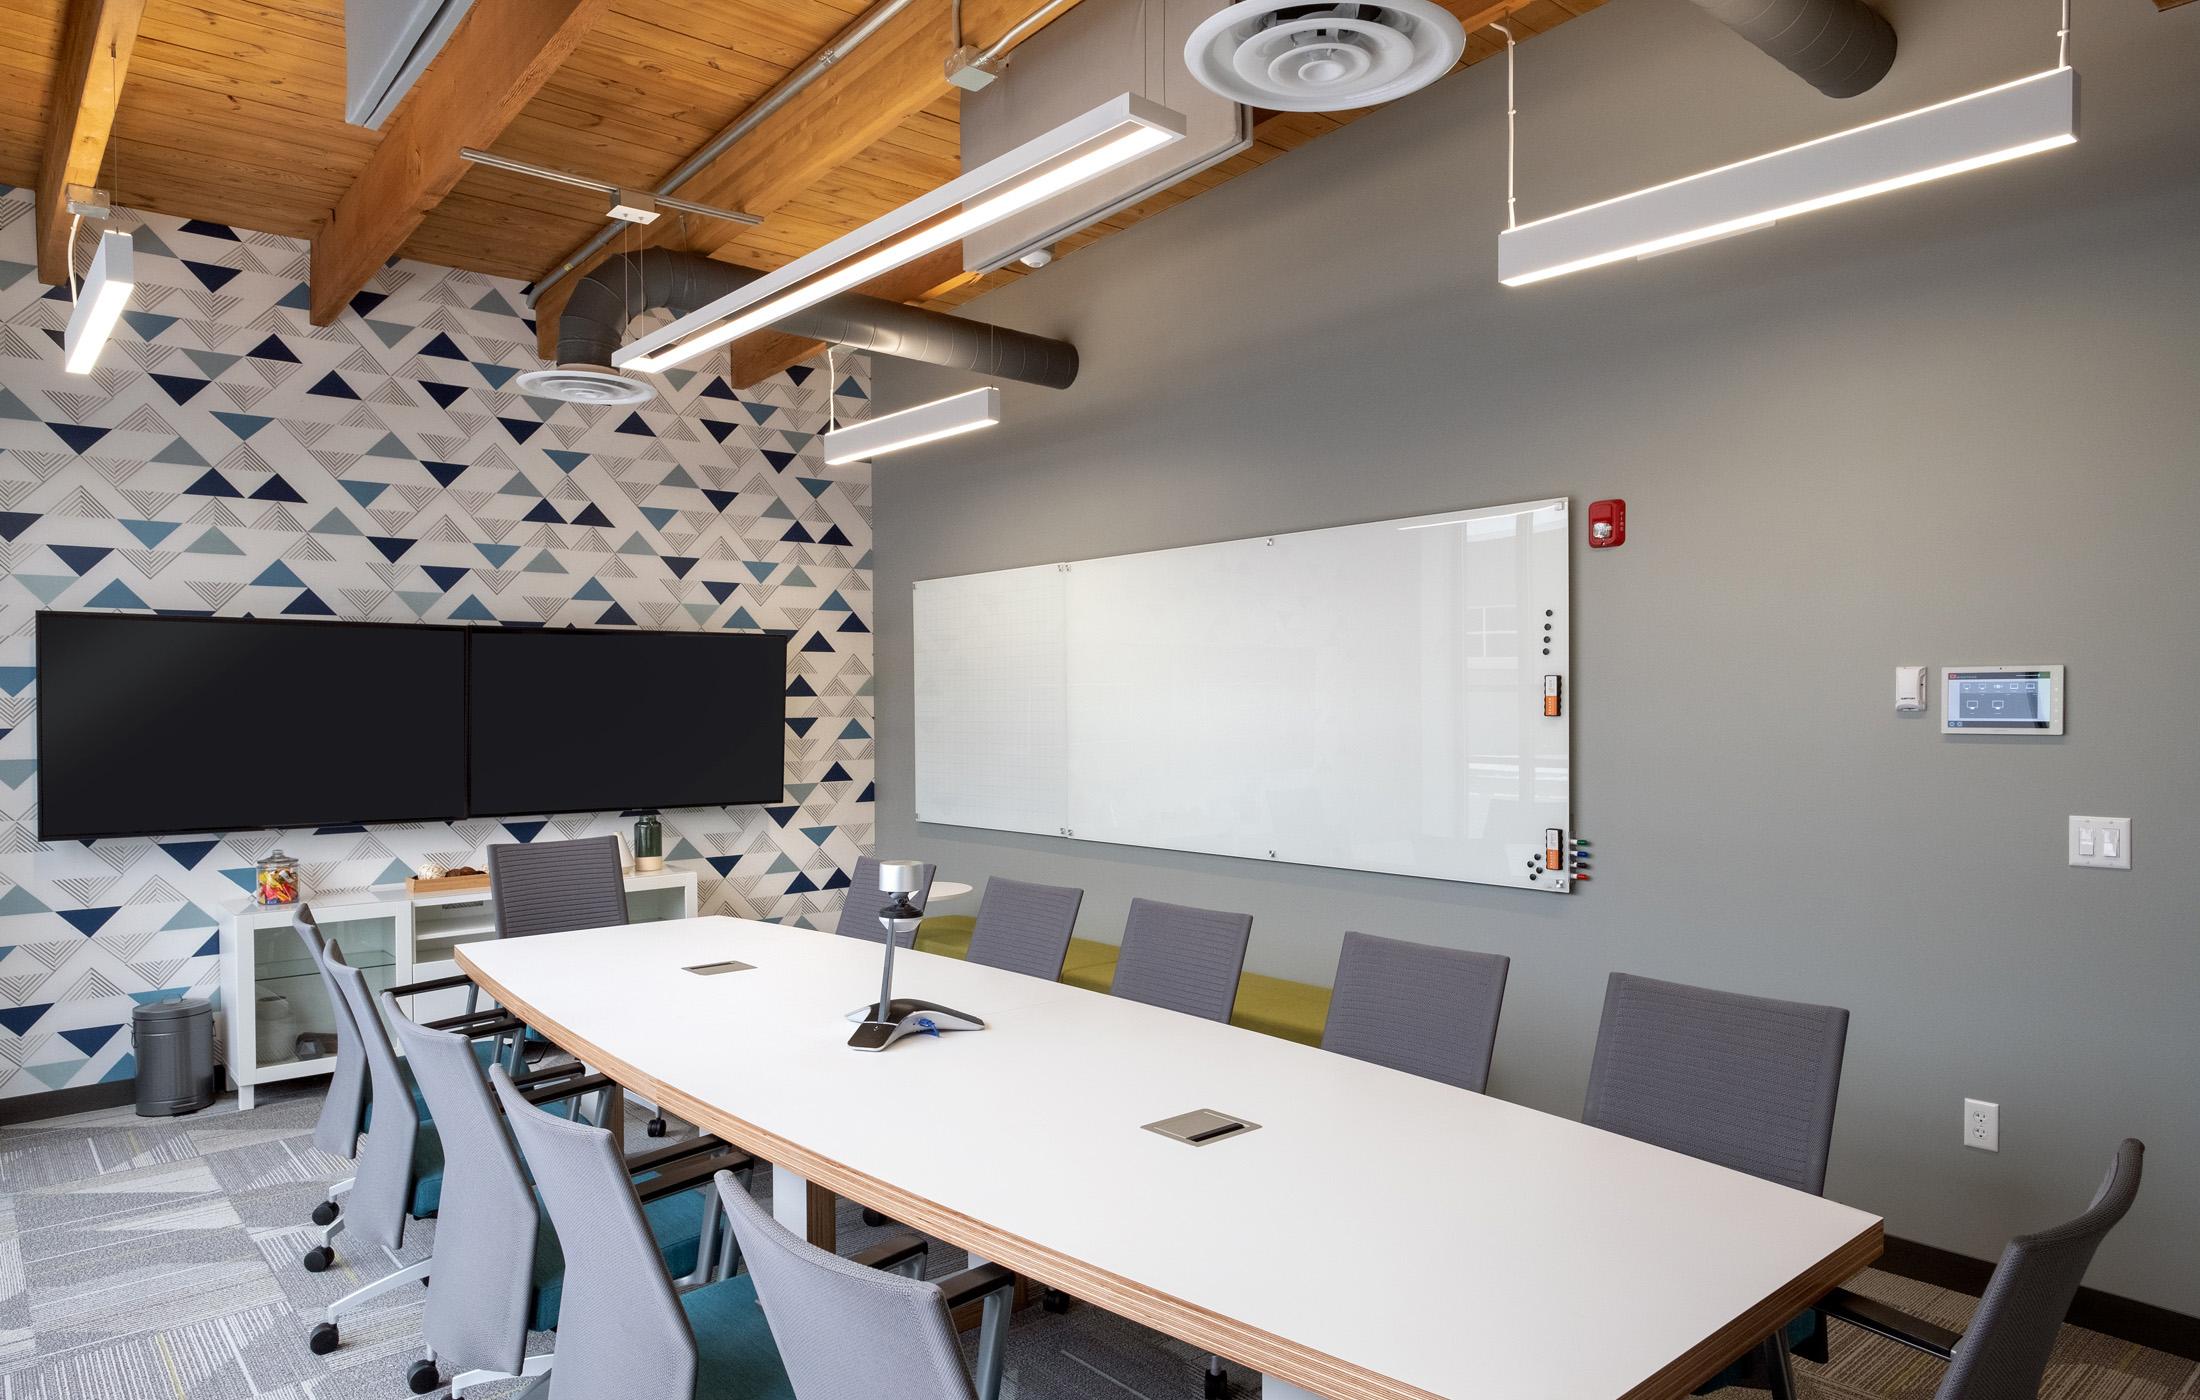 Wightman Kalamazoo large conference room